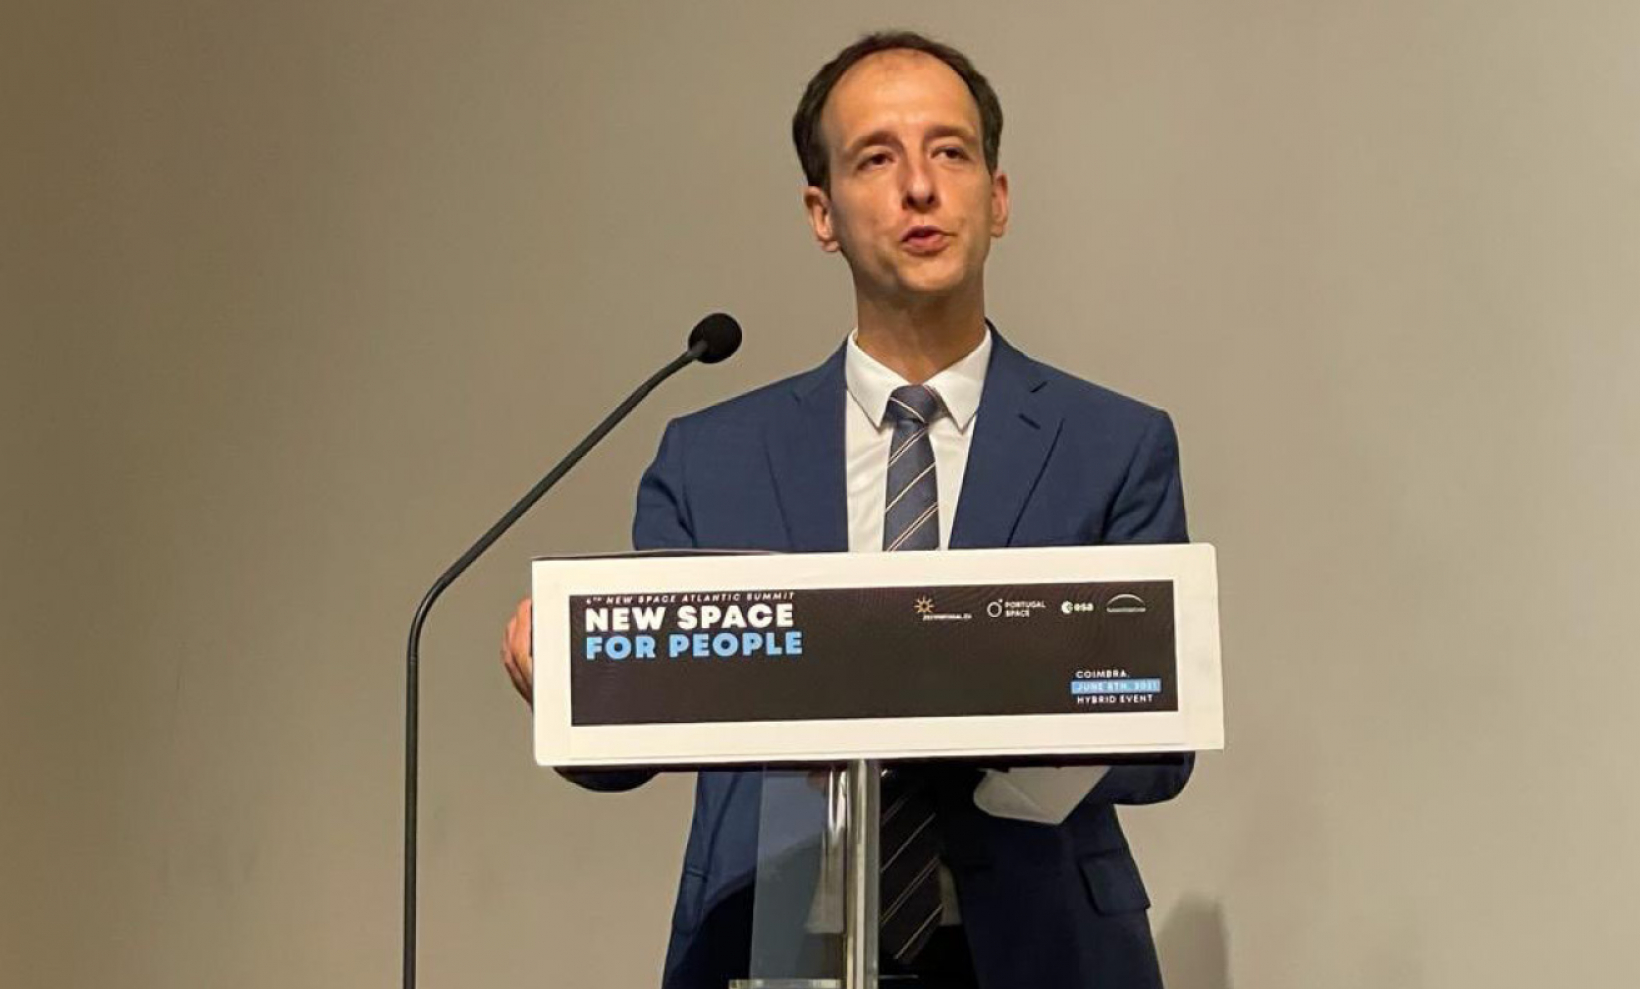 EUSPA Executive Director Rodrigo da Costa spoke at the opening session of the New Space Atlantic Summit.